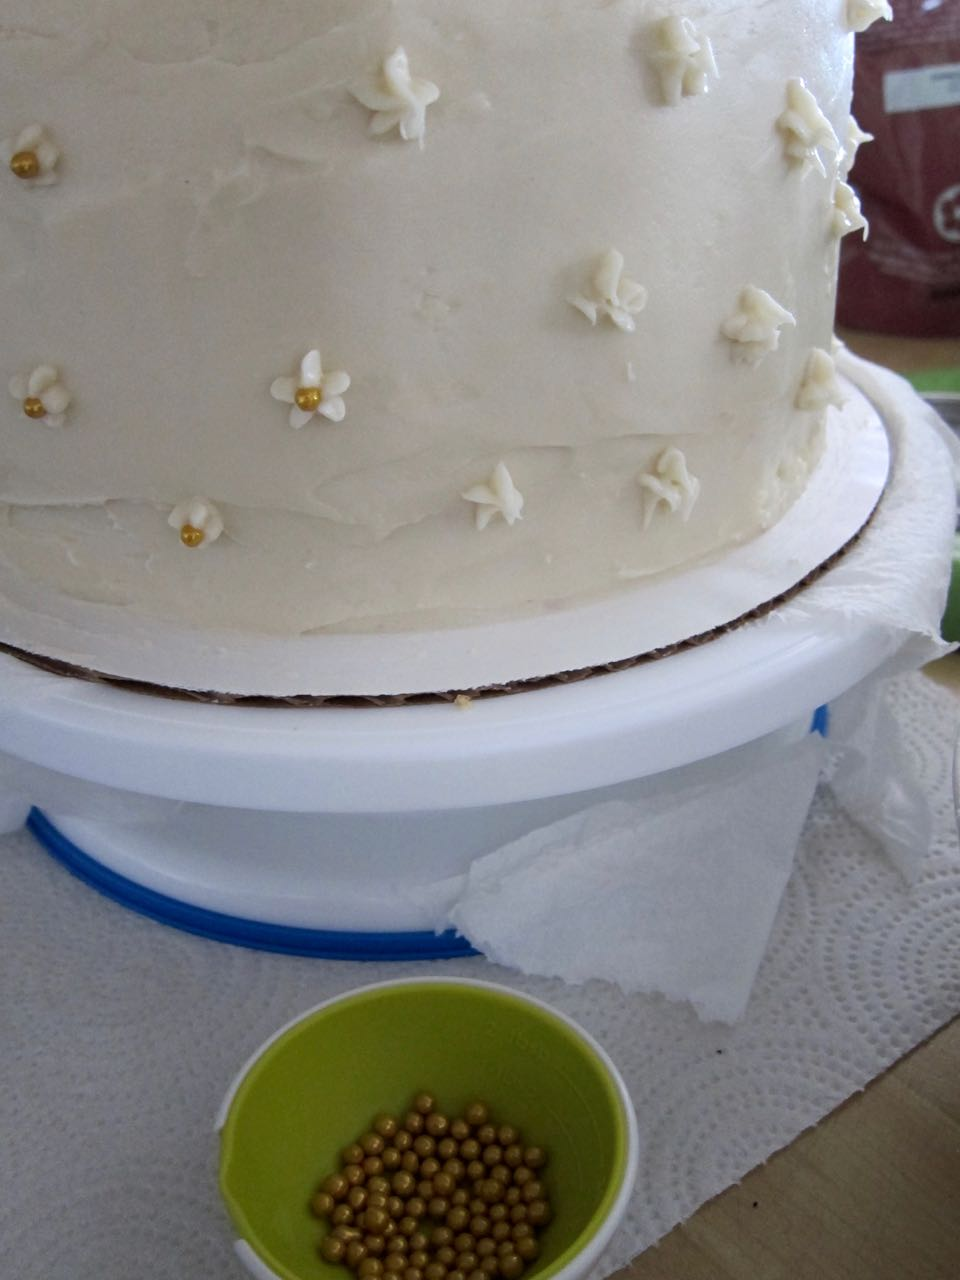 Decorating American Flag cake.jpg